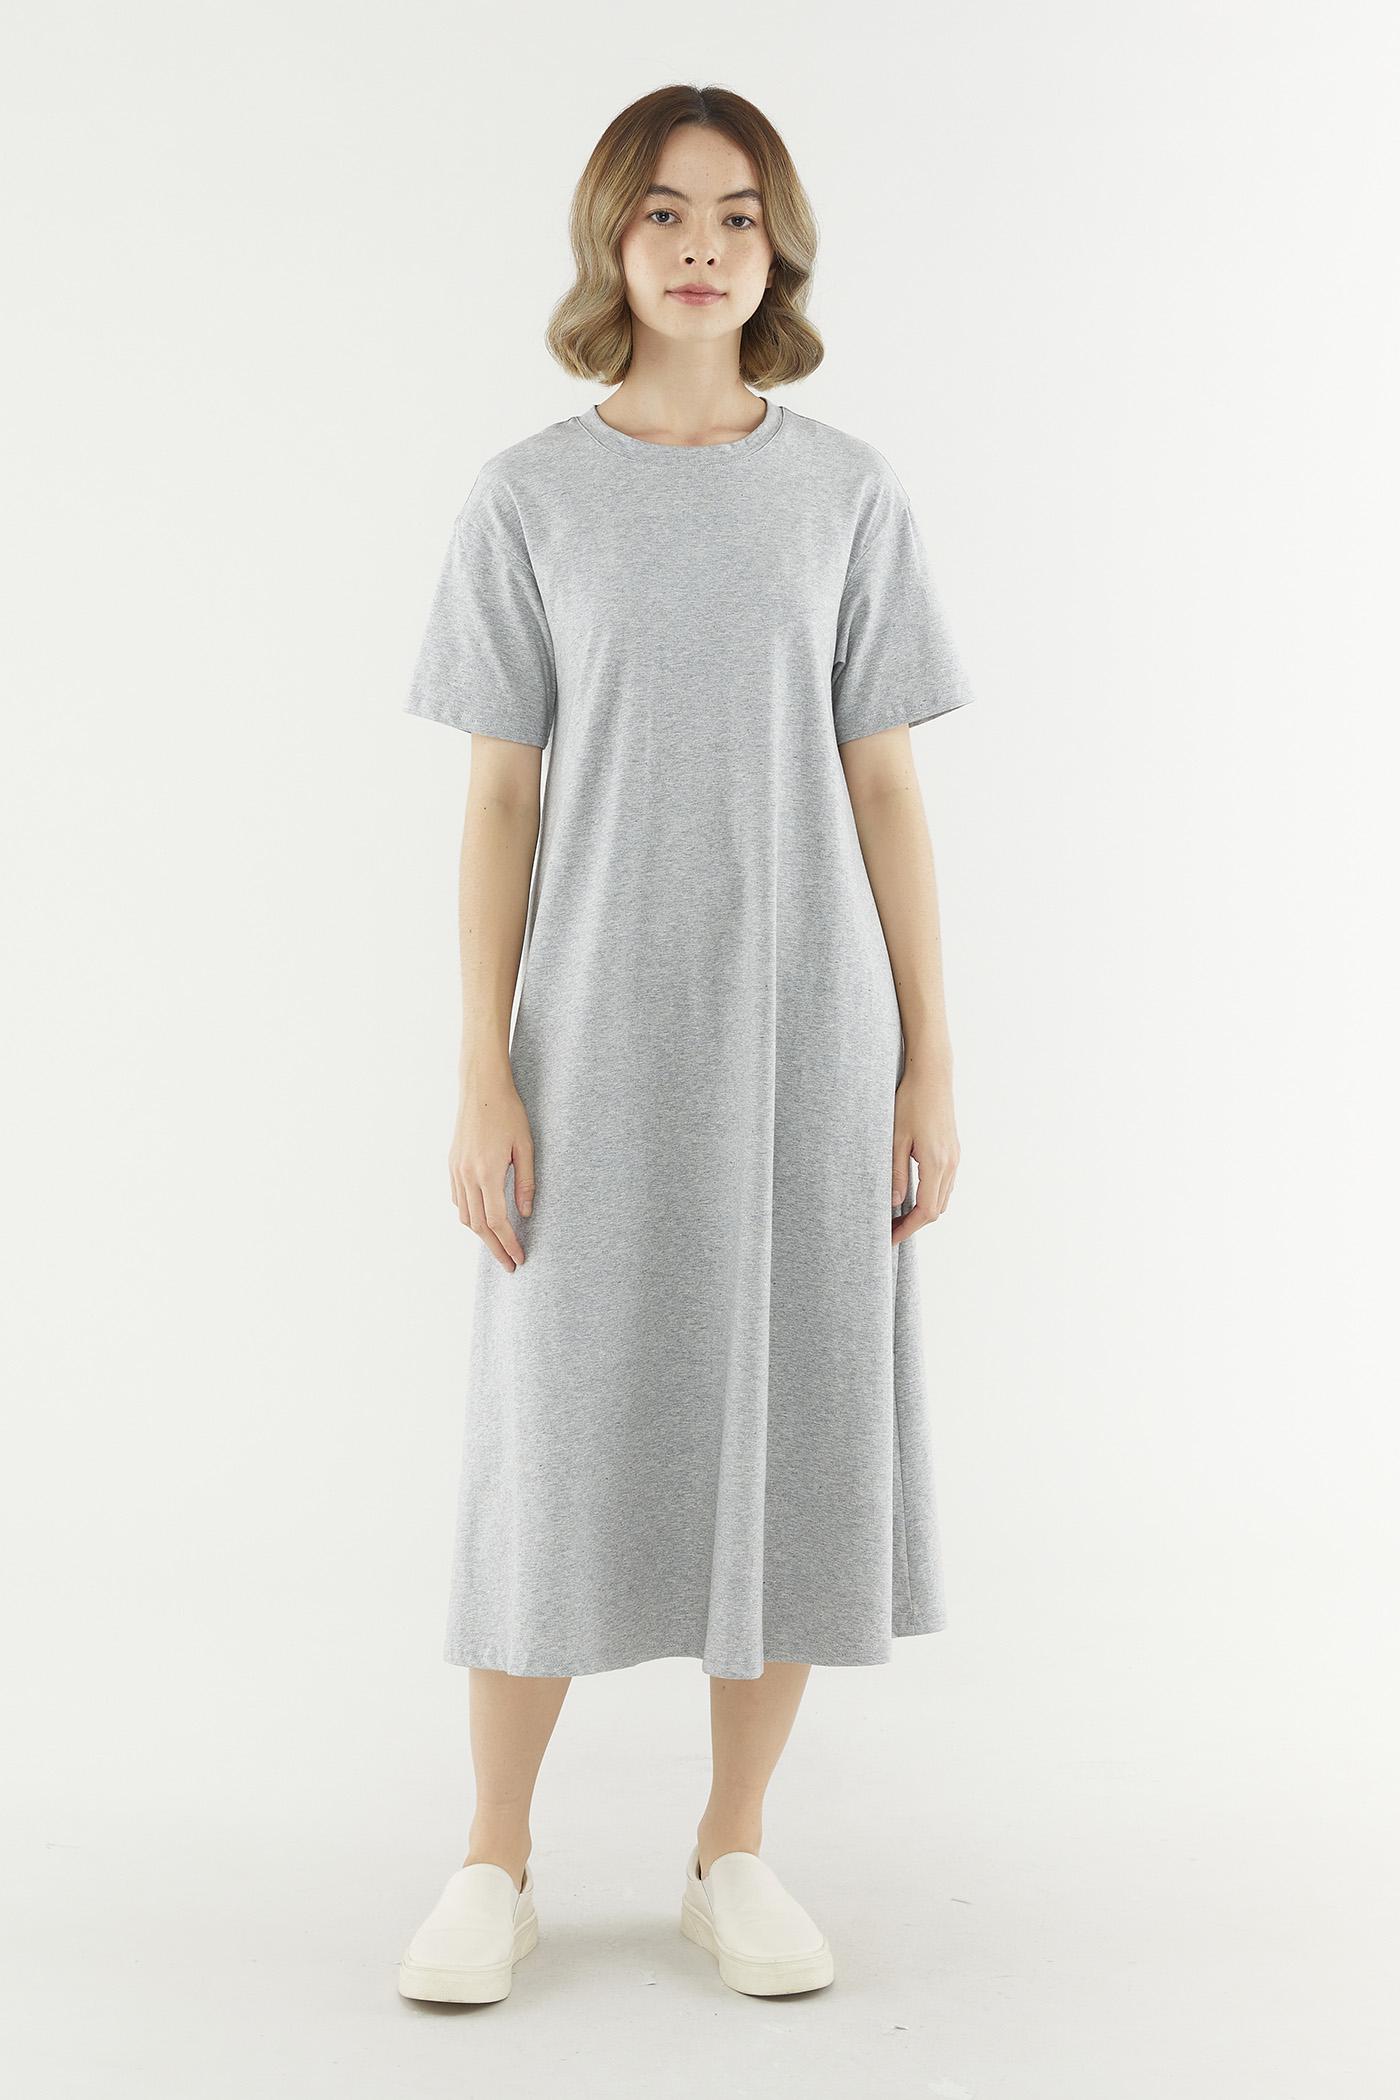 Yudita T-shirt Dress